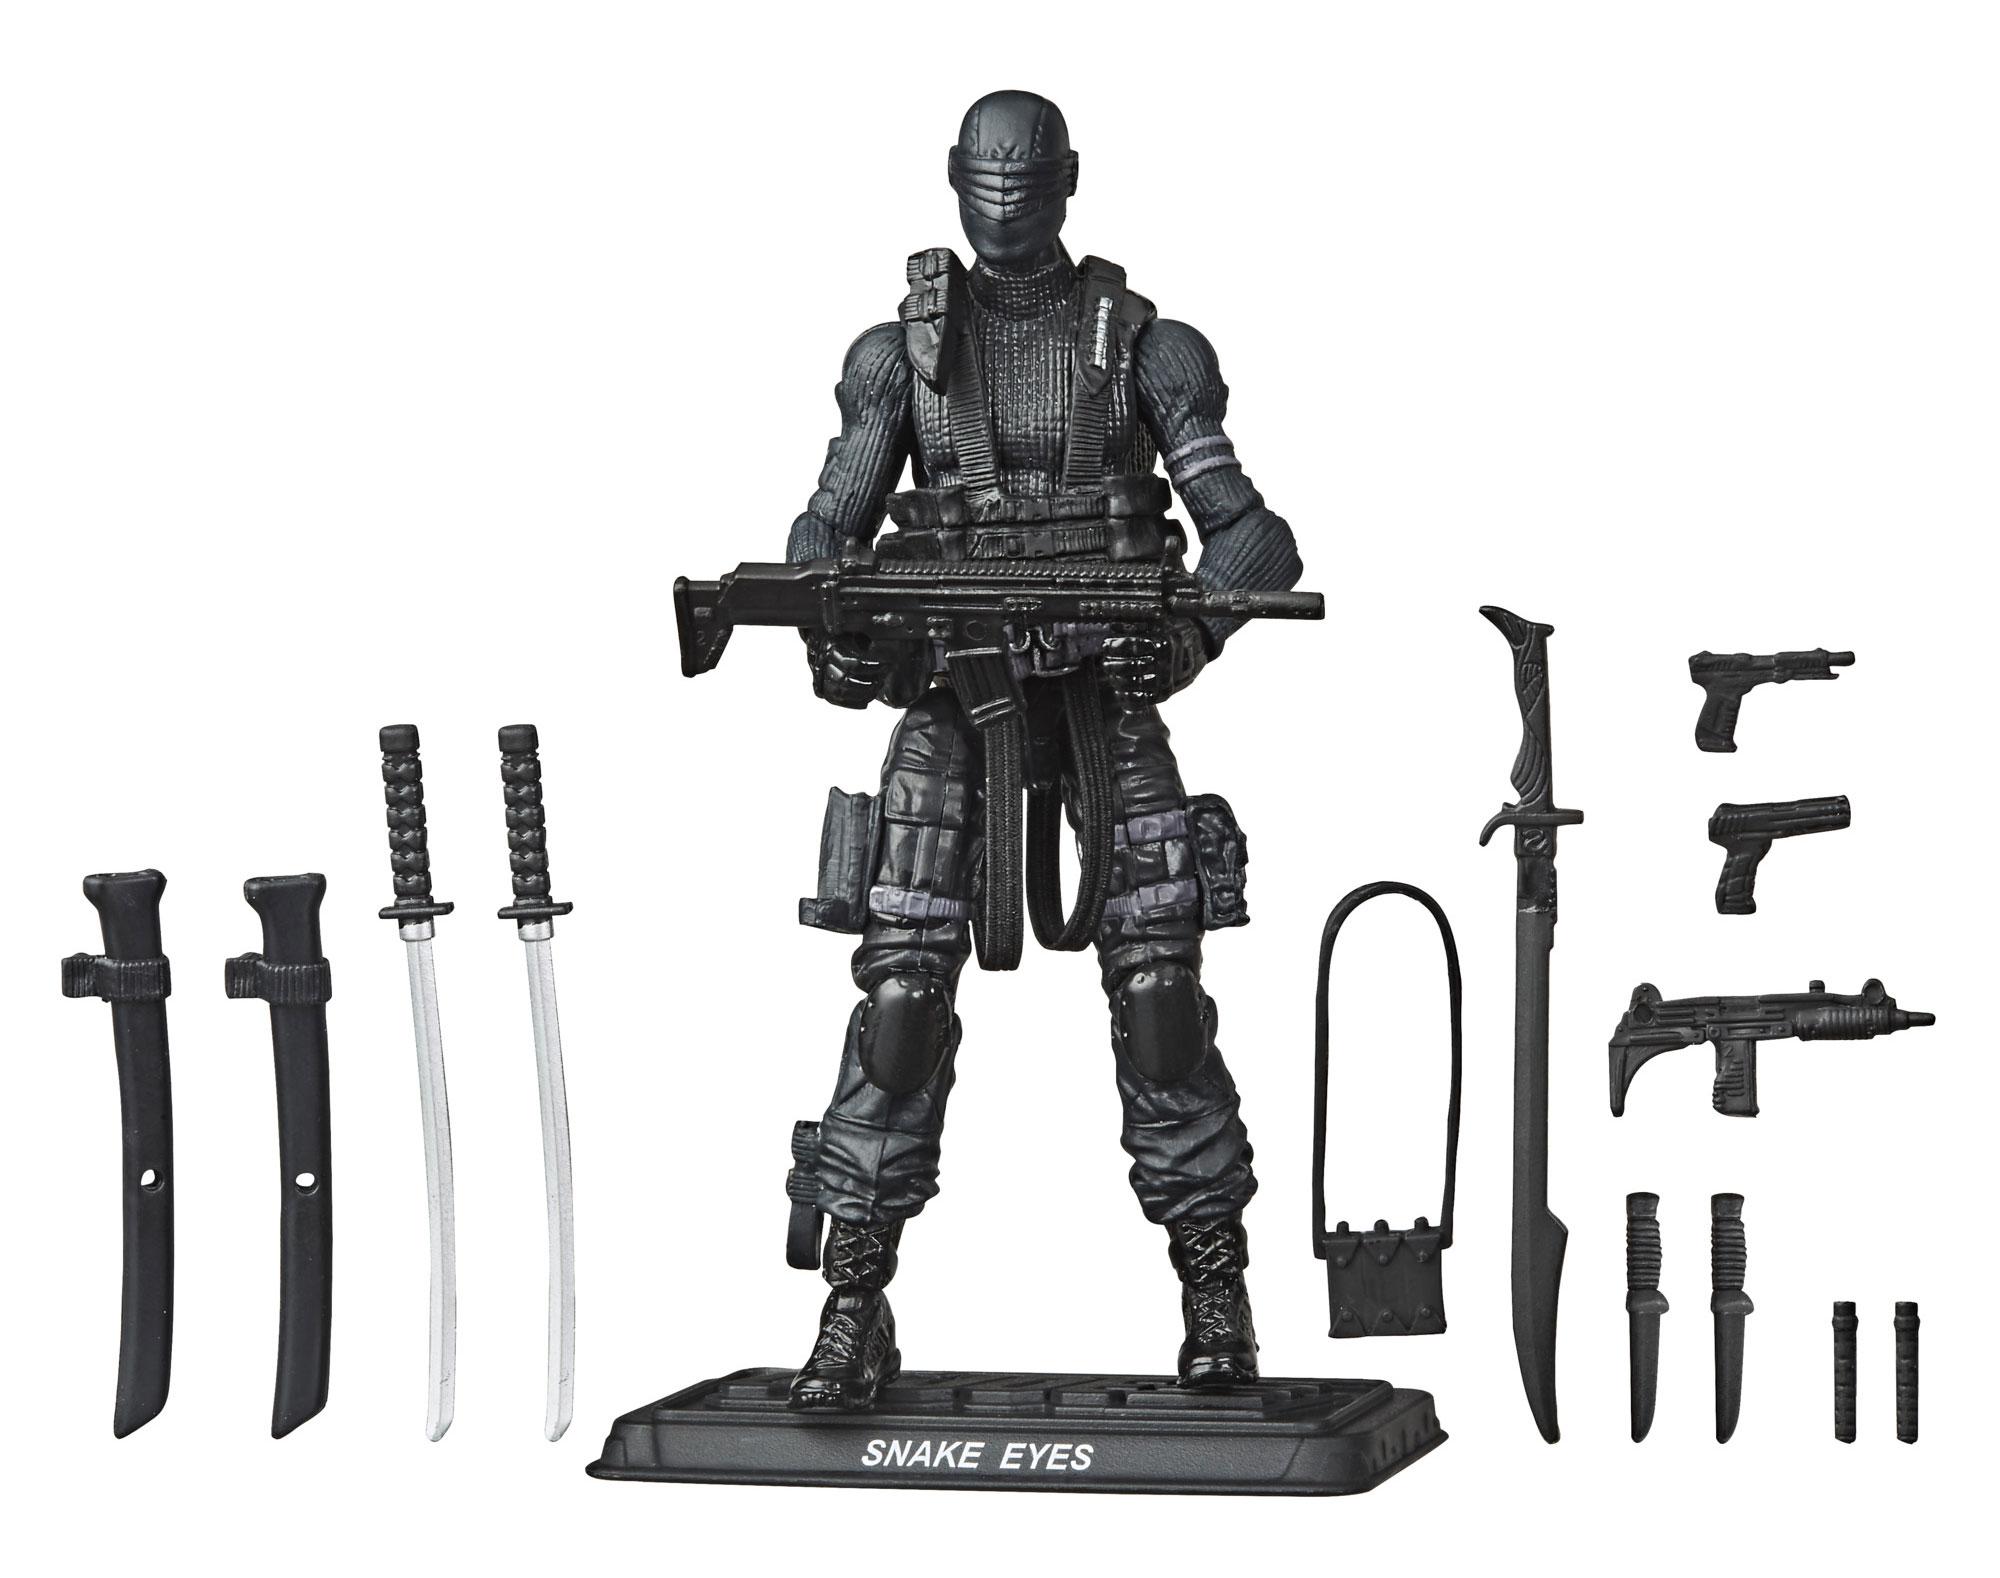 Snake-Eyes-GIJOE-Retro-Line-Walmart-Exclusive-action-figure-1